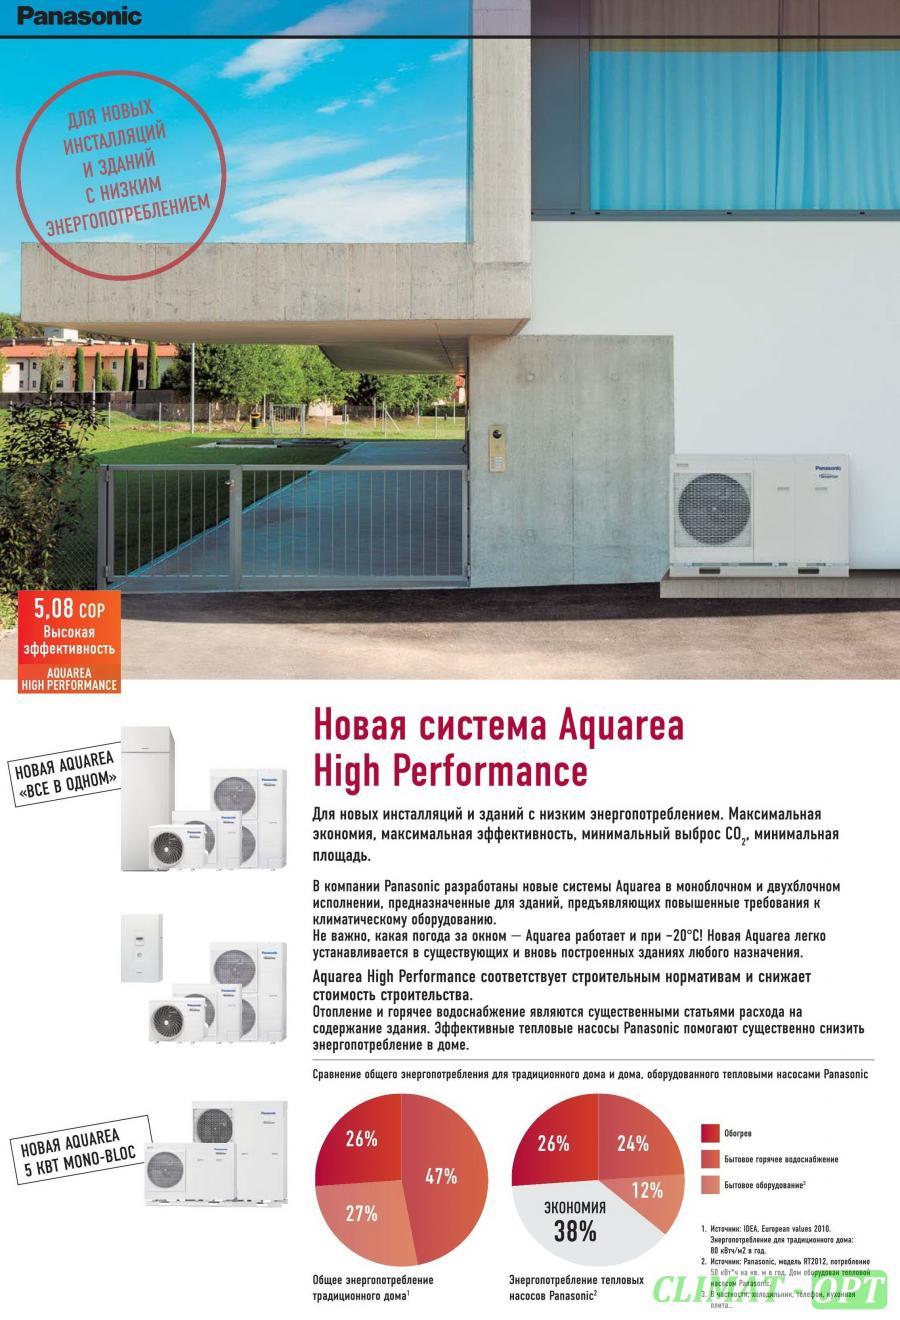 Тепловой насос Panasonic Aquarea T-CAP. bi-block с гидромодулем